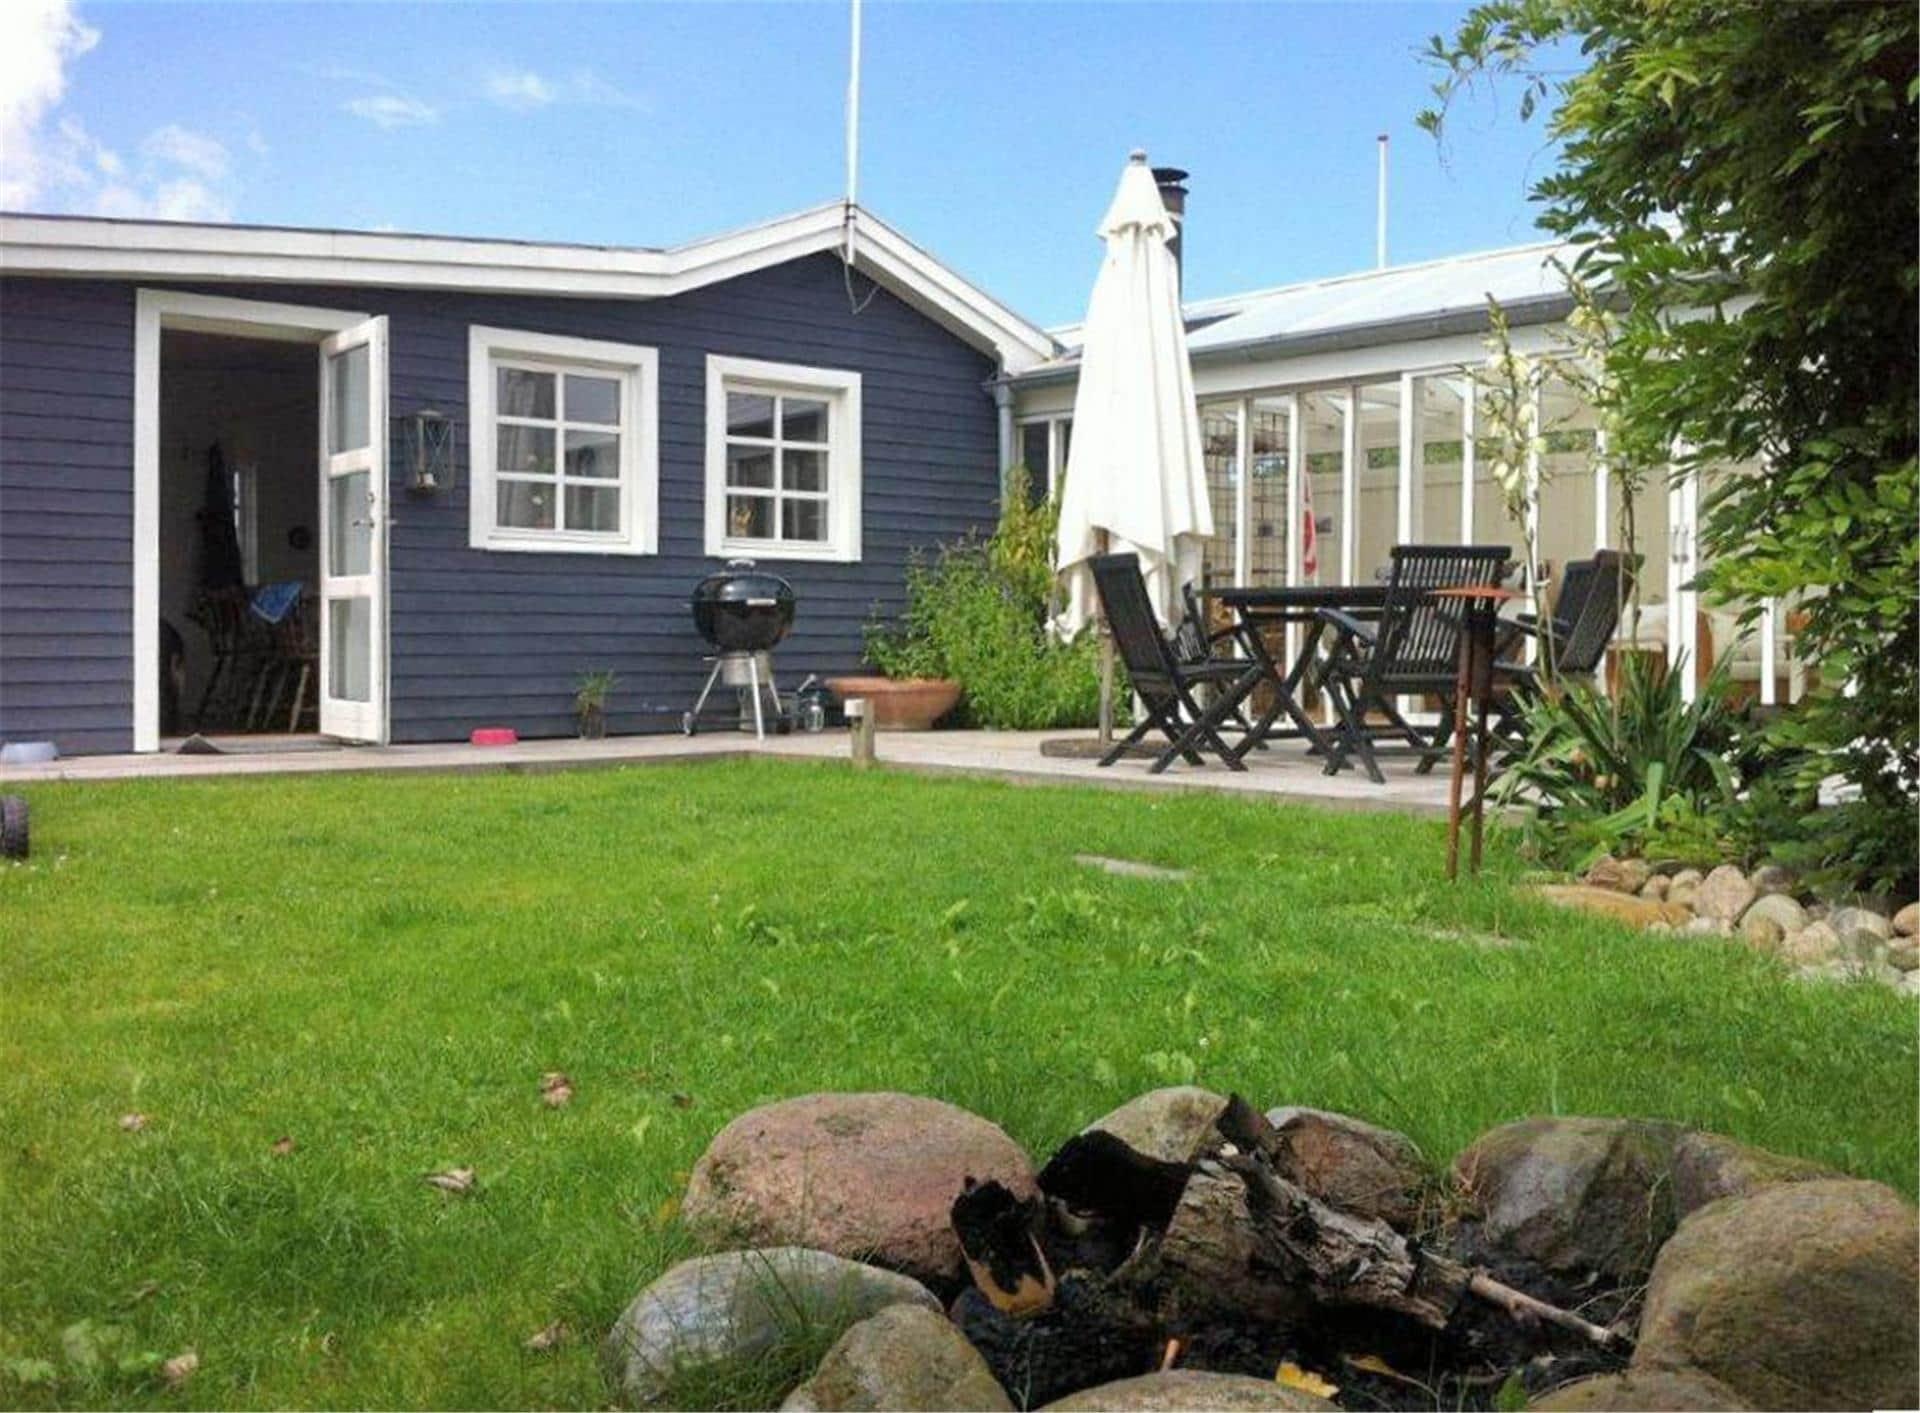 Afbeelding 1-3 Vakantiehuis M645586, Slusevej 4, DK - 5450 Otterup